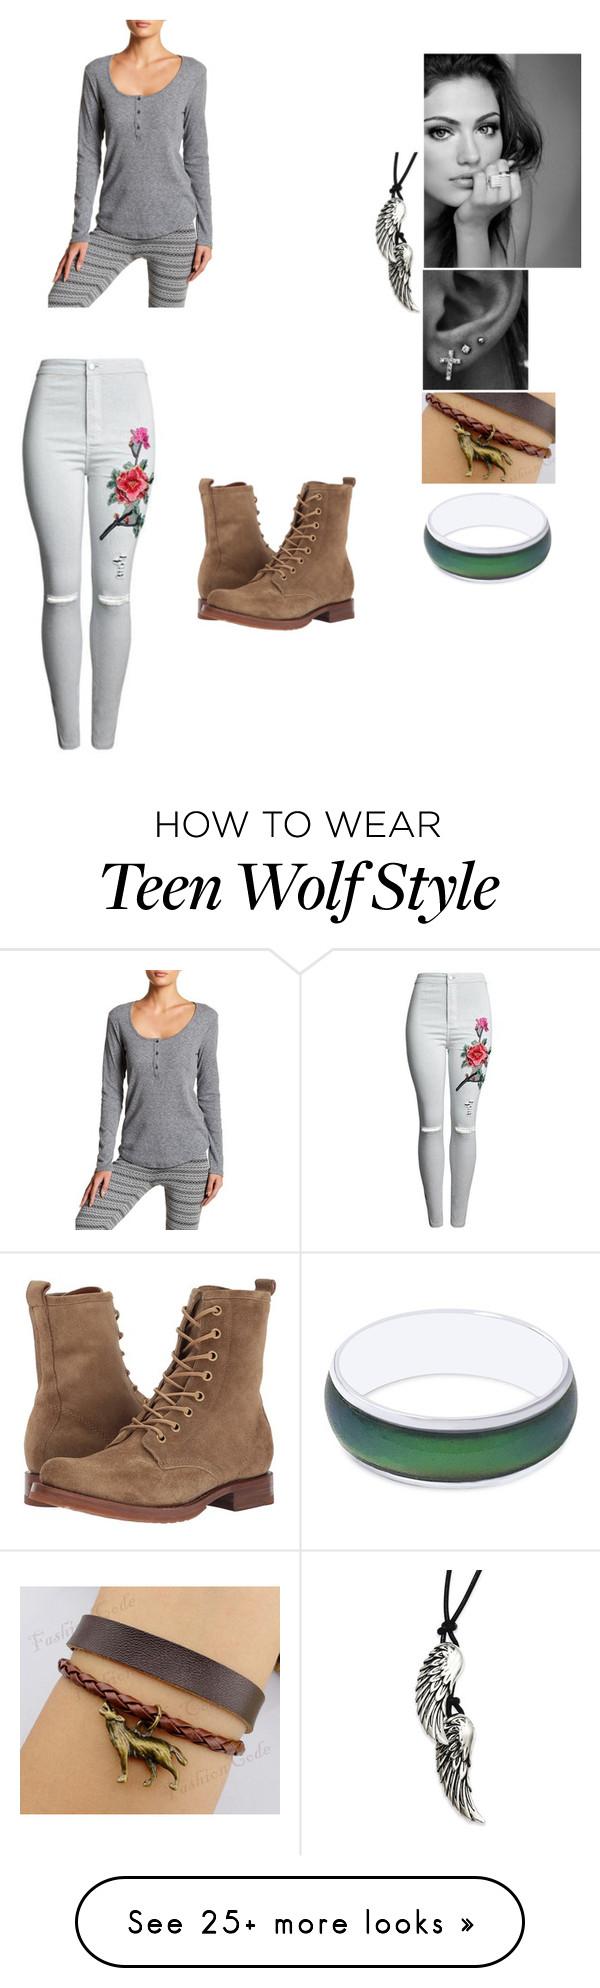 For more fresh teen